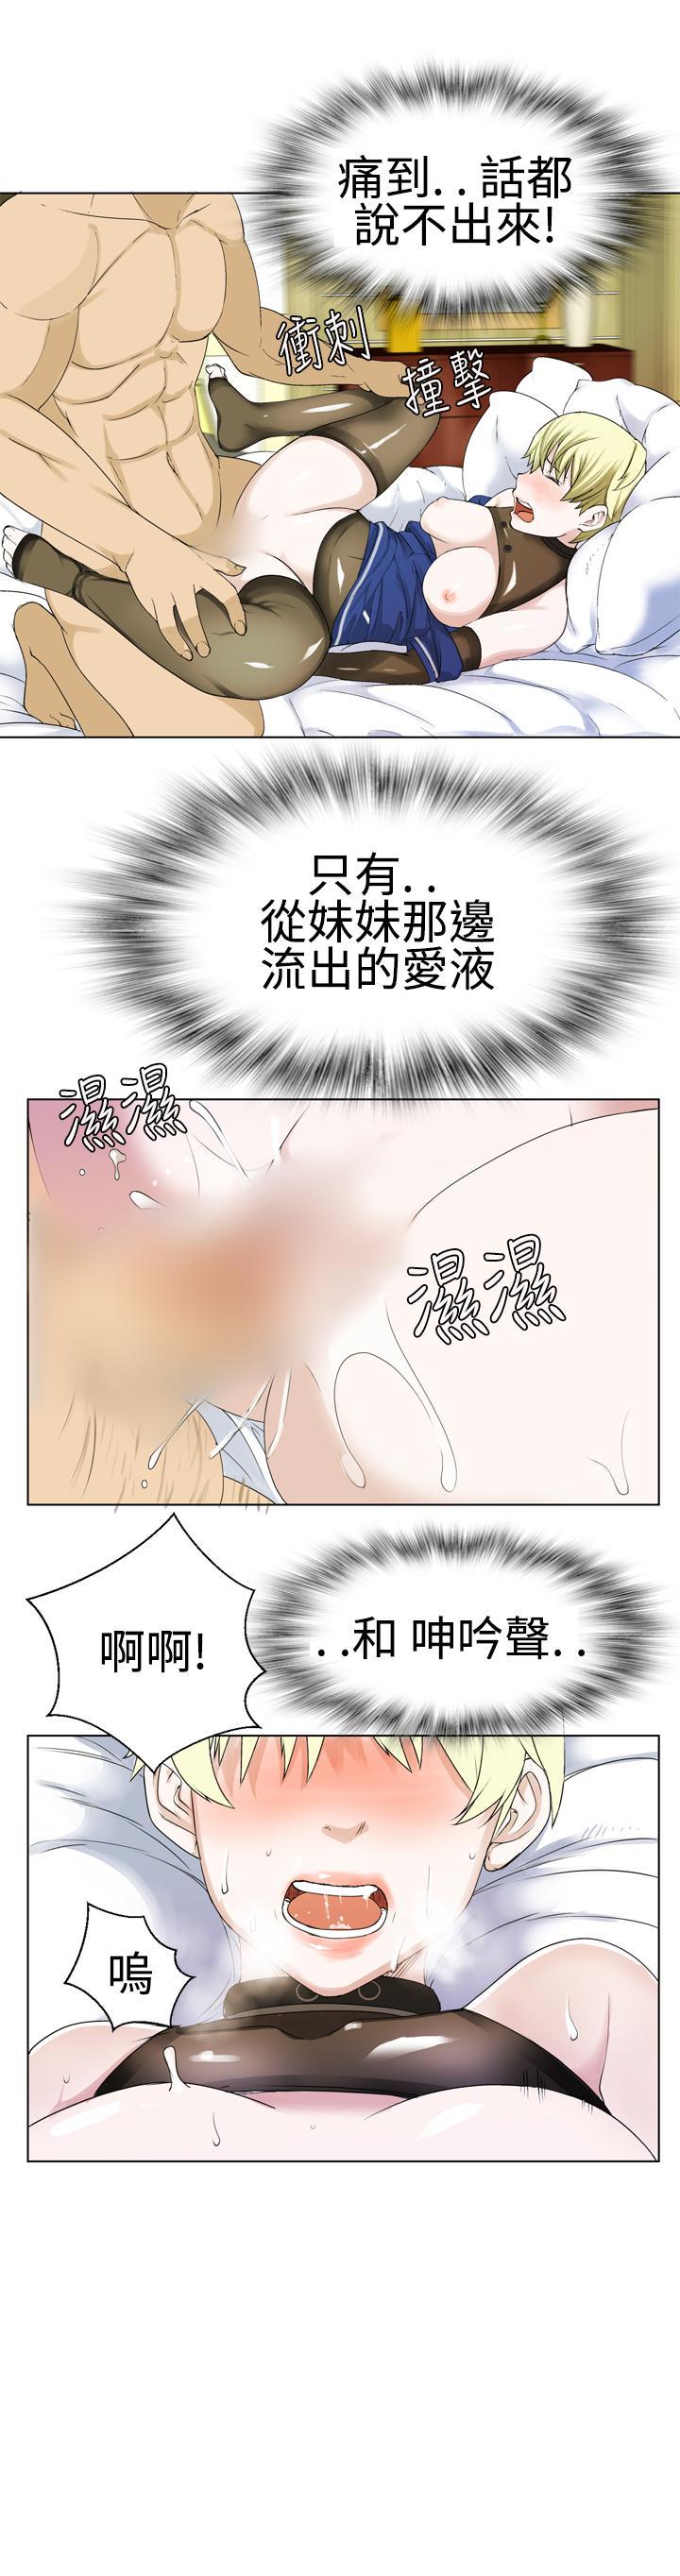 [SOSO] Franken Jo 为爱而生 法兰克赵 Ch.1~19 [Chinese]中文 419